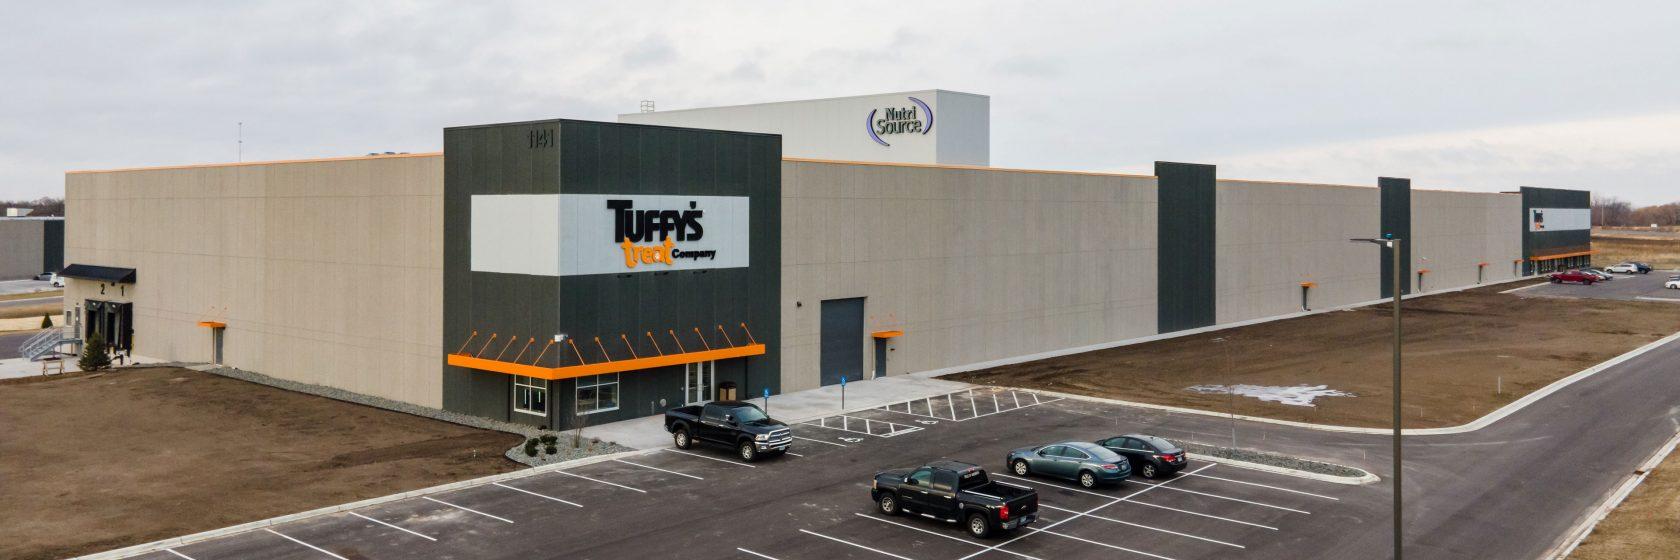 pet treat manufacturing facility exterior